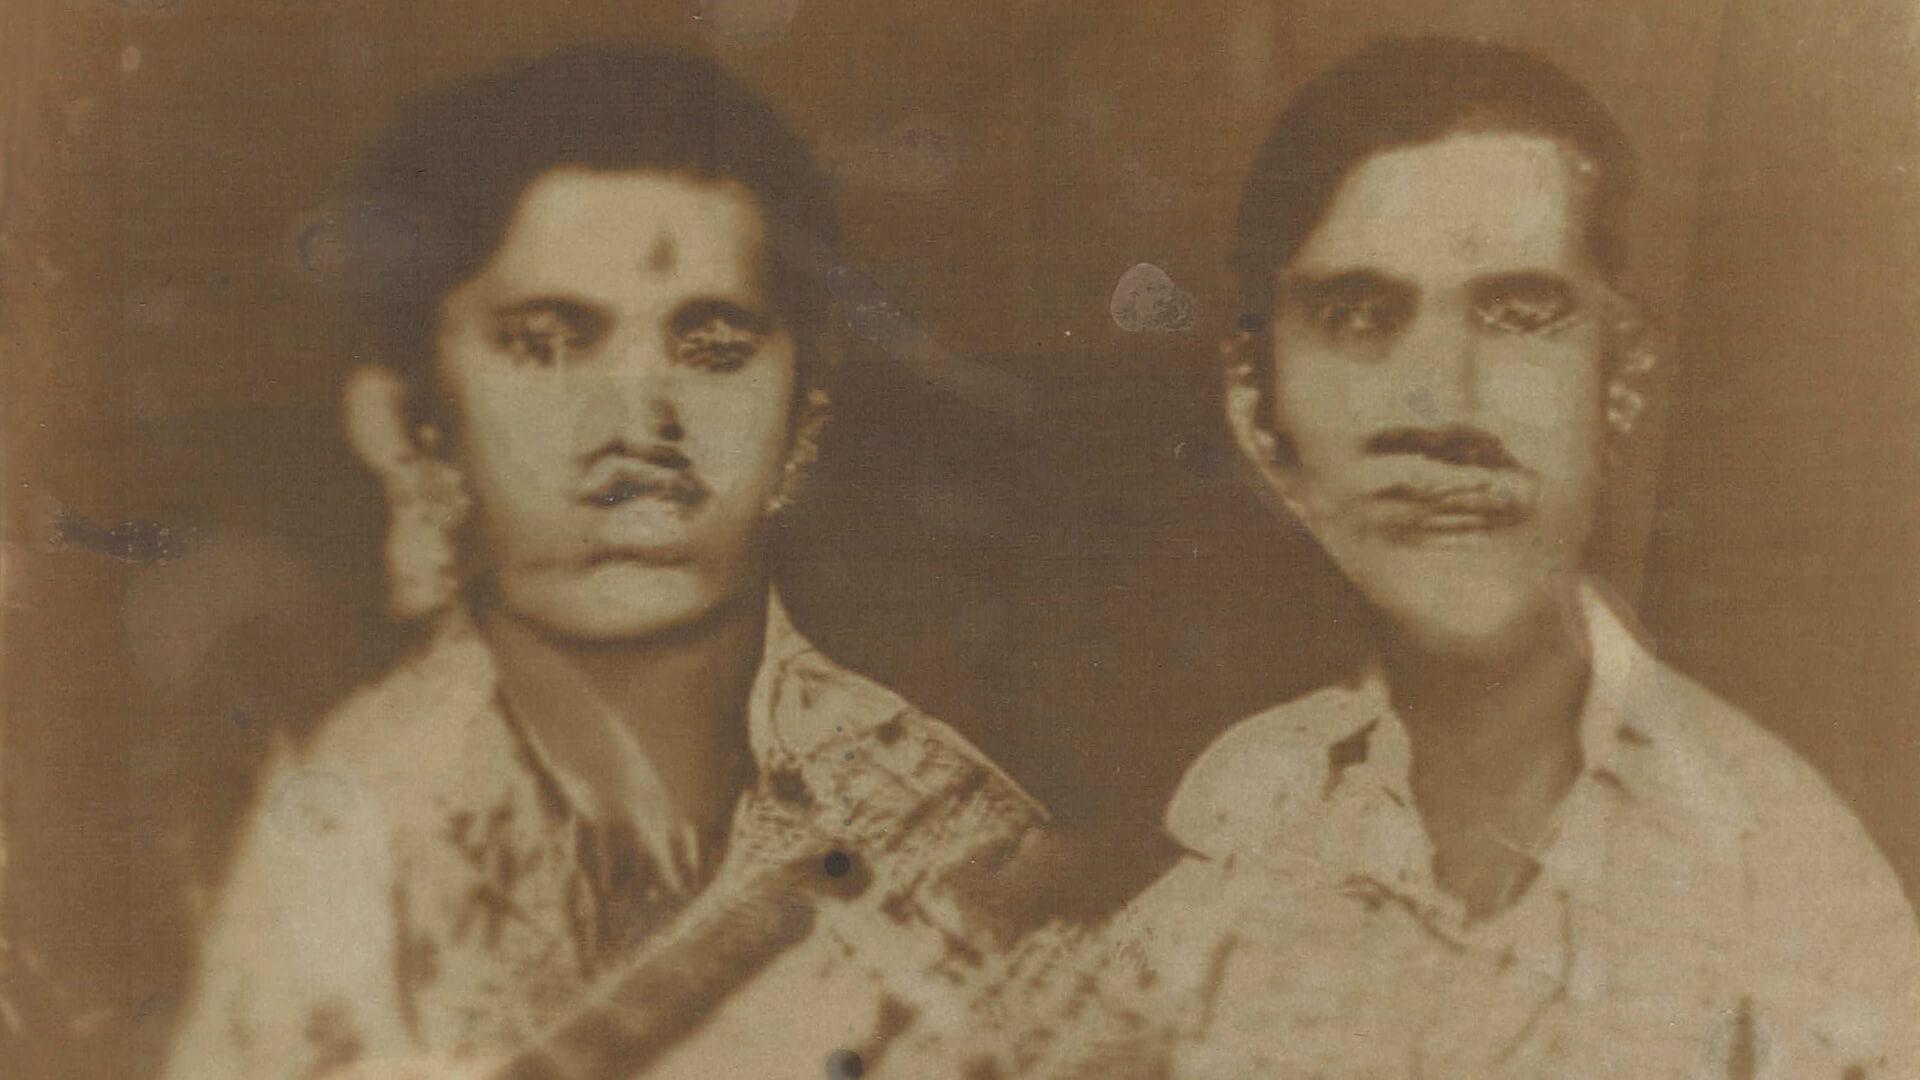 Aarati Akkapeddi on the poetics and politics of beauty and identity through data sets